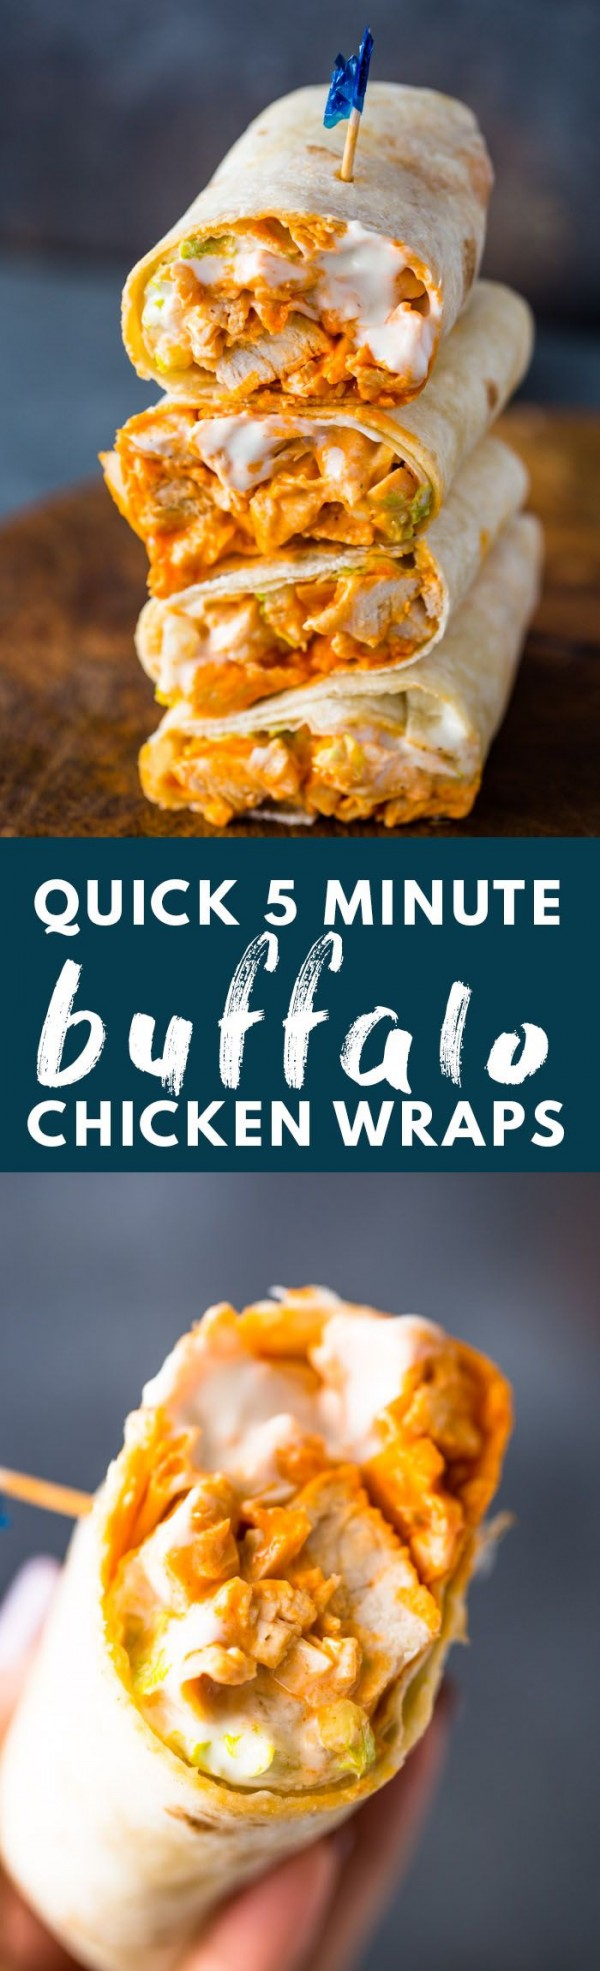 50 Best Chicken Recipes Ever - Check out this recipe for Buffalo chicken wraps. Yummy! #RecipeIdeas @recipes_to_go